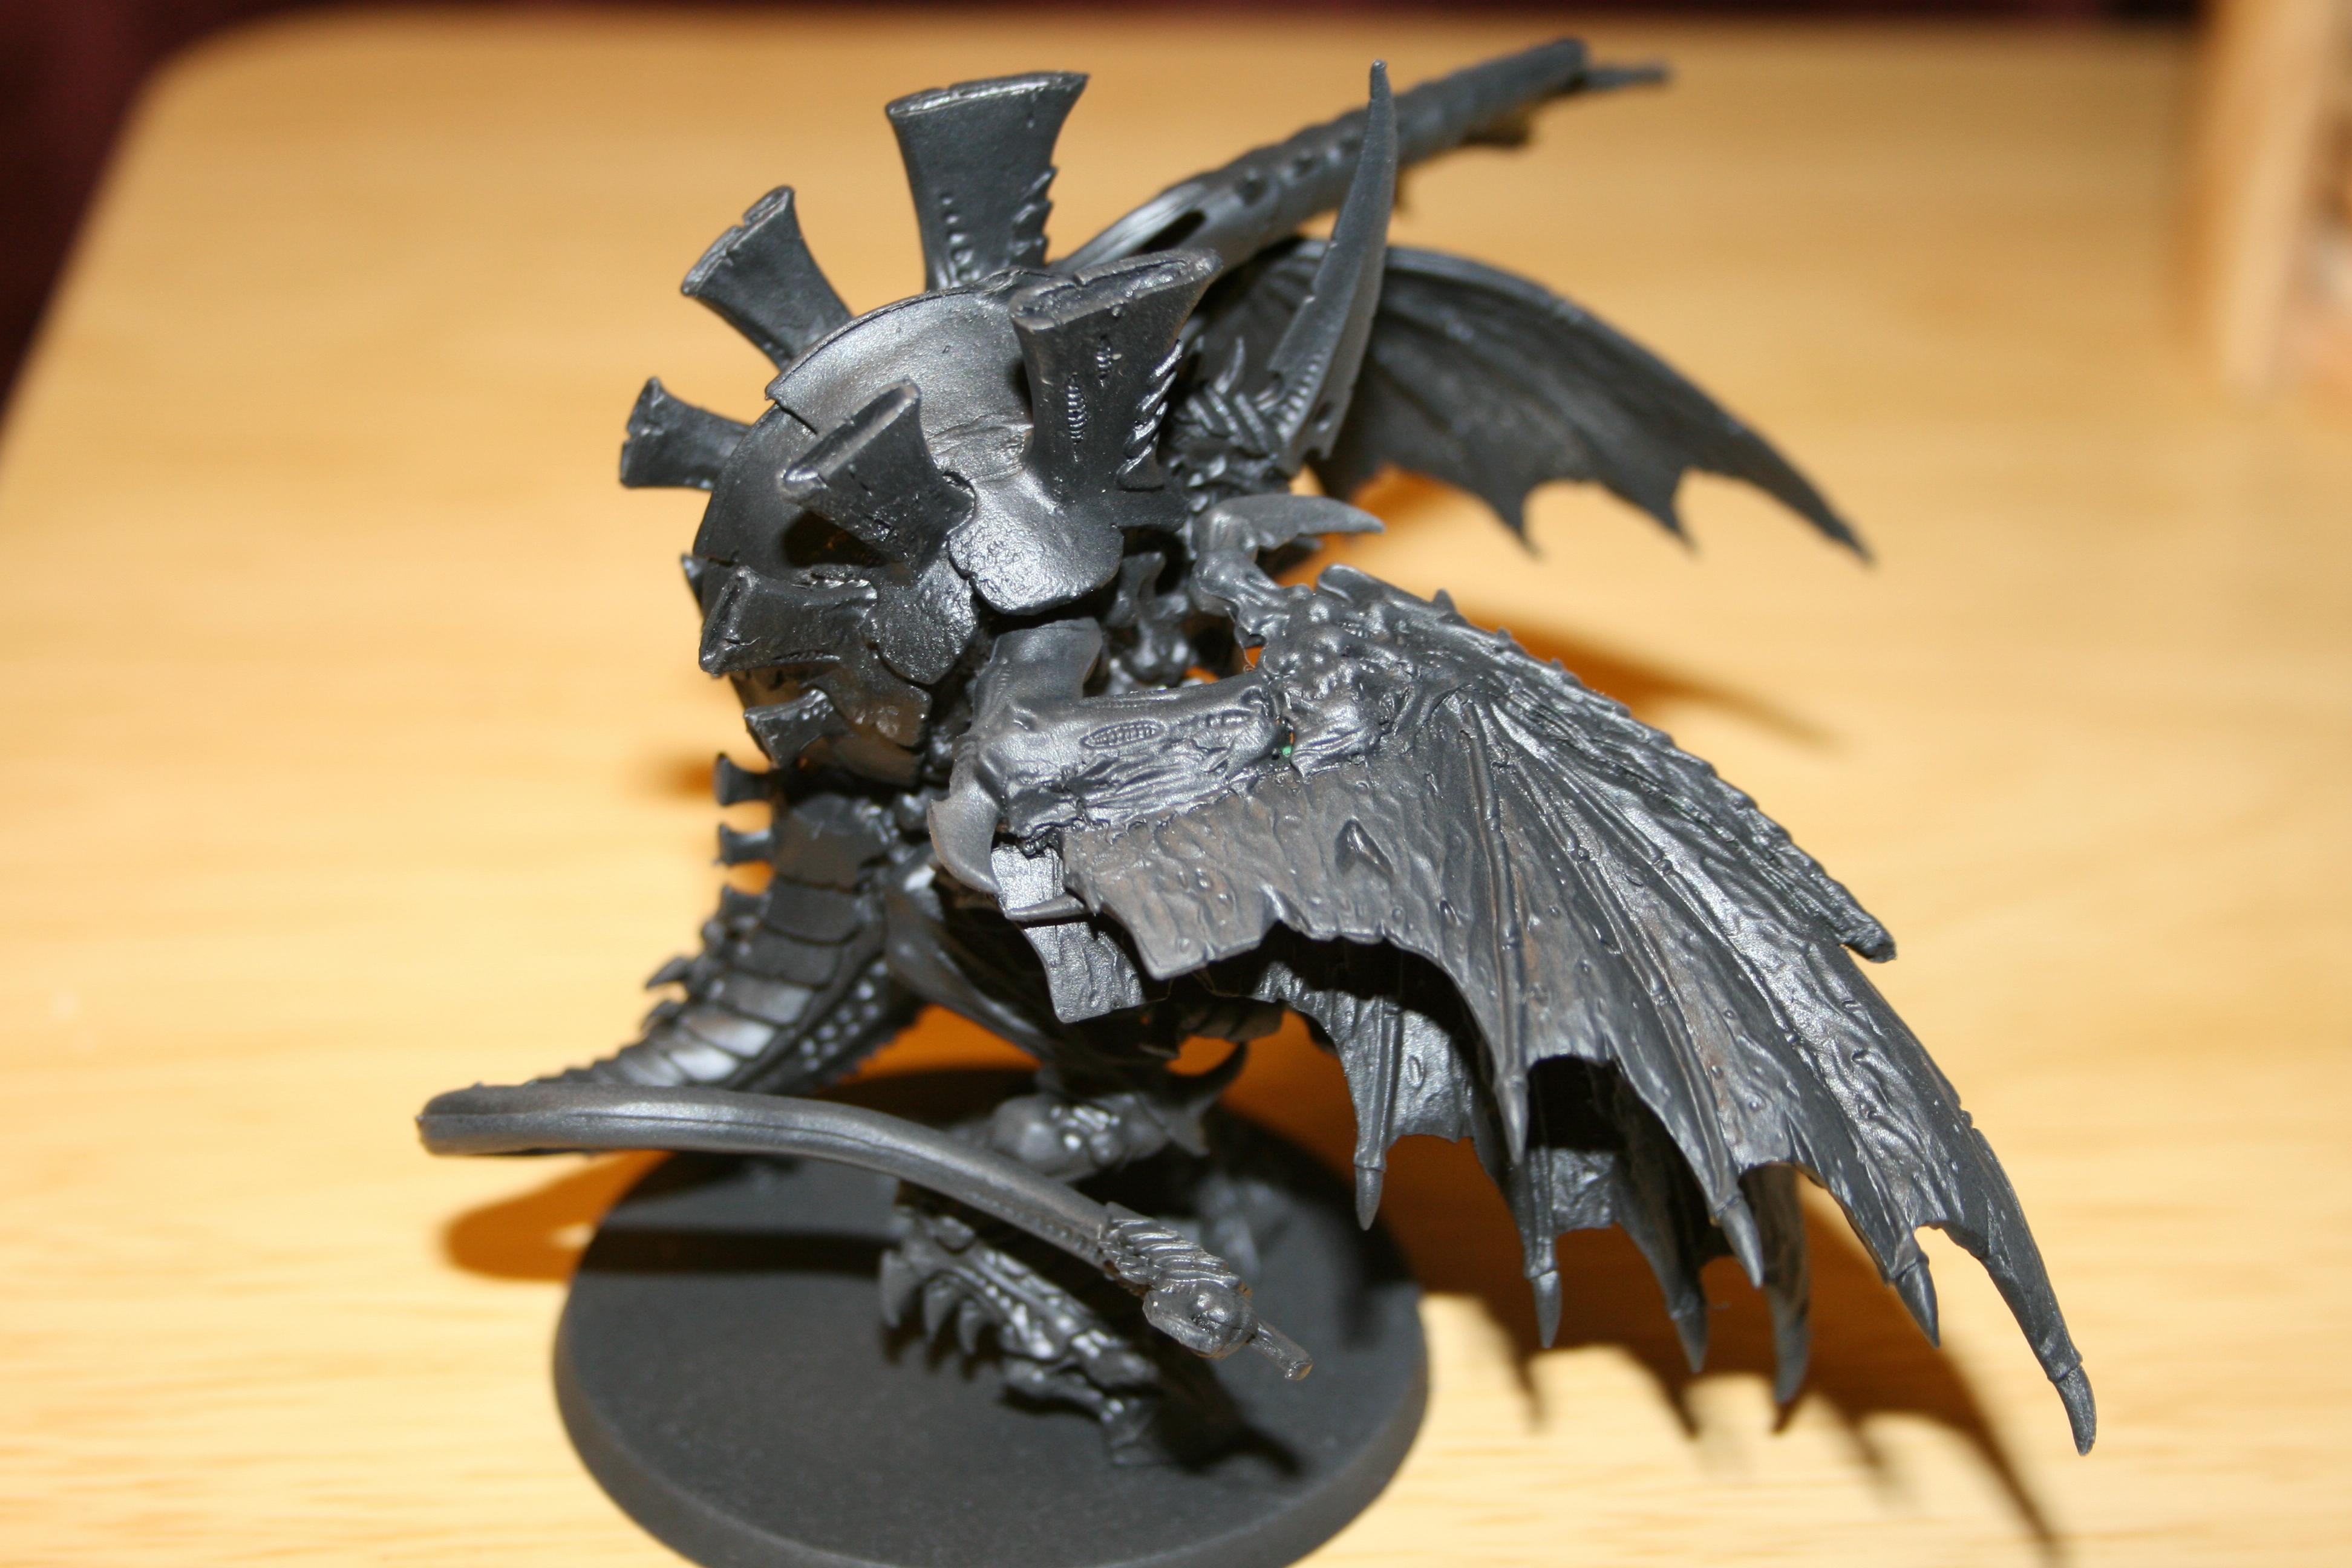 Tyranids, Warhammer 40,000, Winged Tyrant